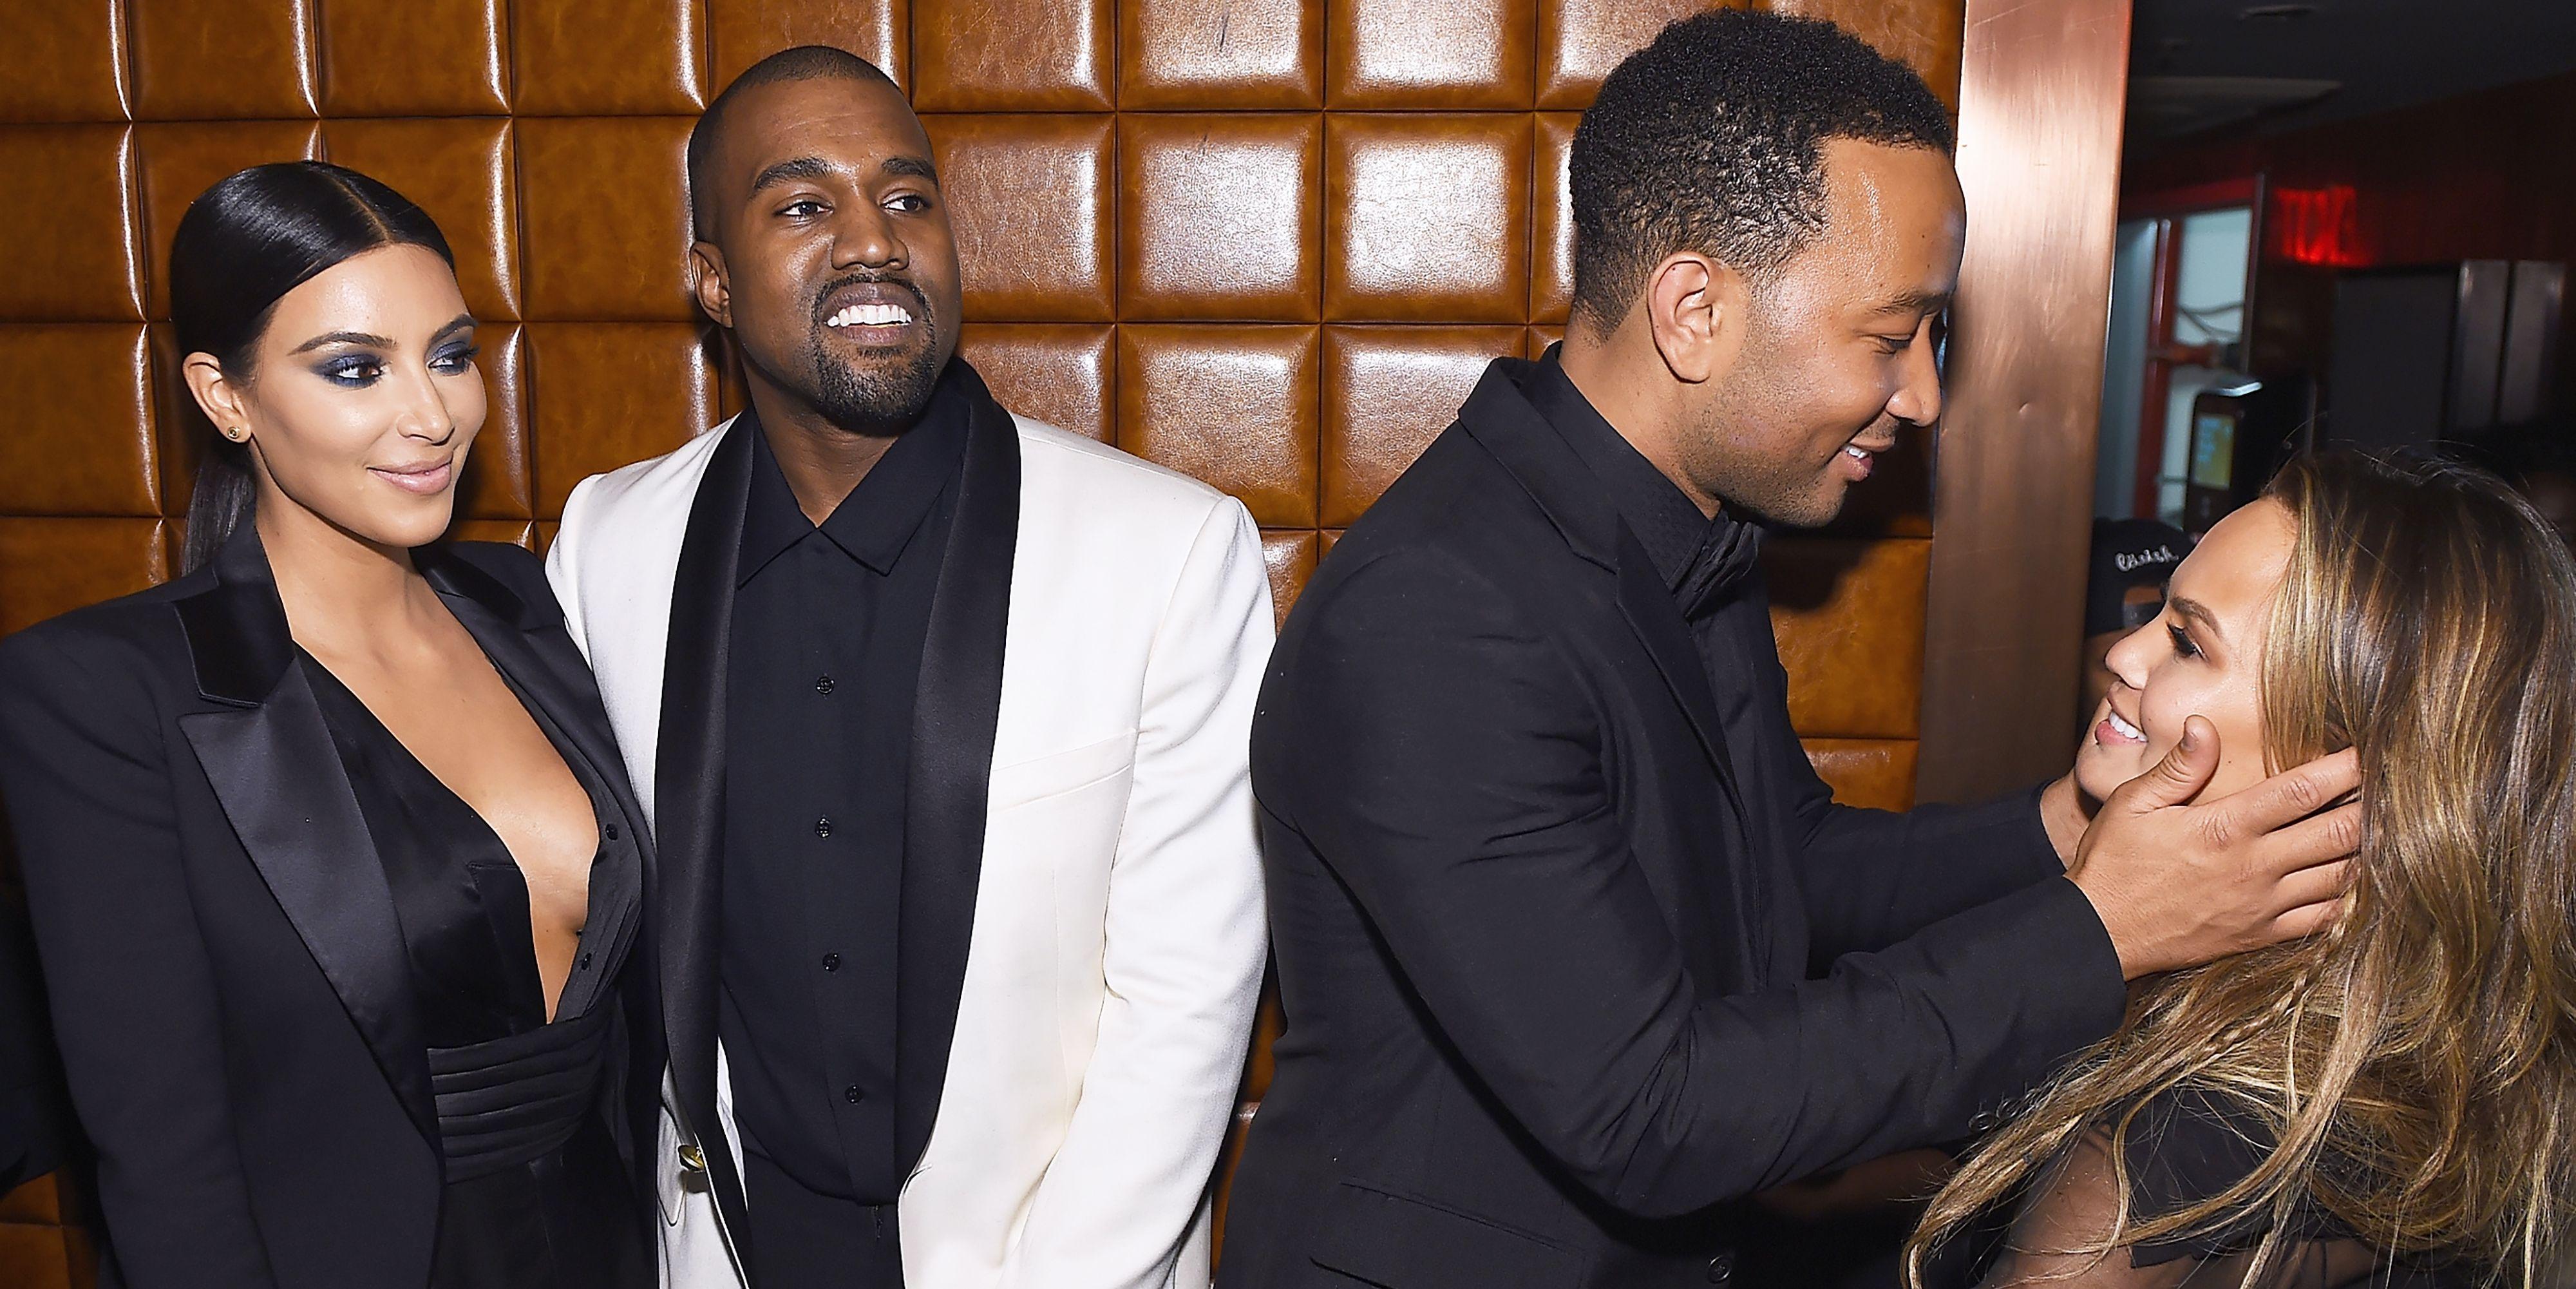 Kanye West Kim Kardashian Chrissy Tiegen John Legend